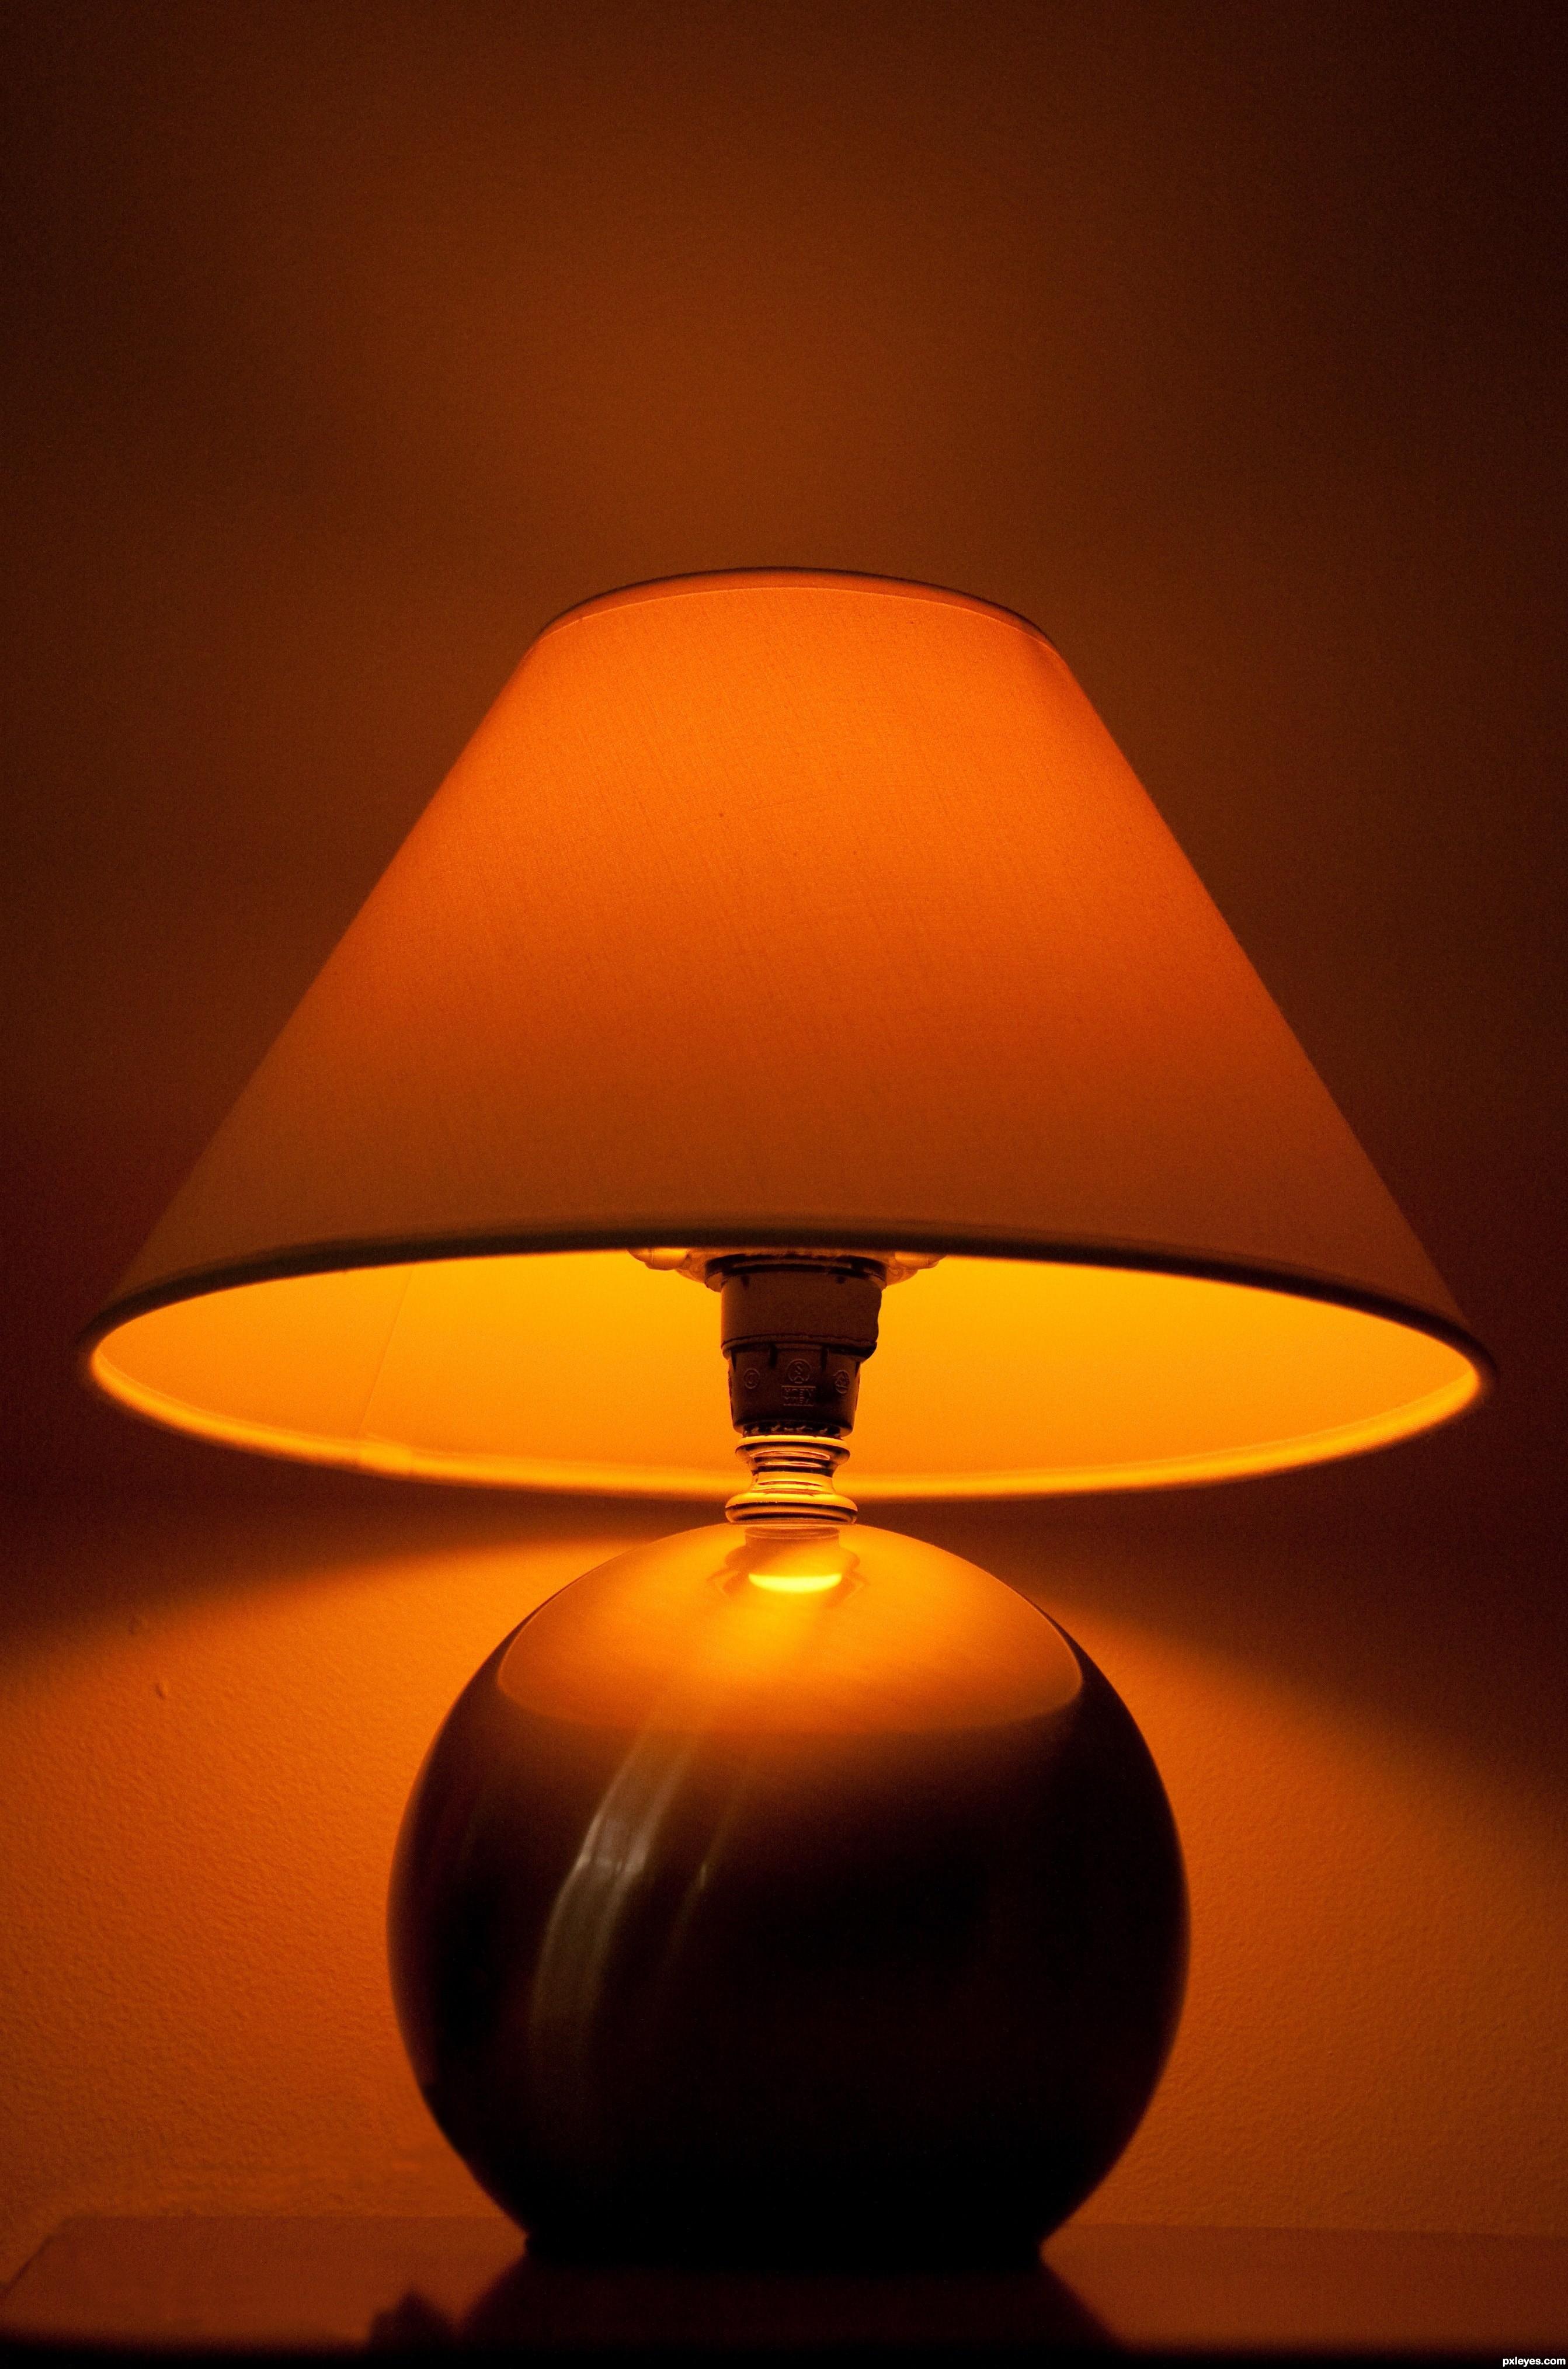 Night Lamp picture, by bartoszwozniak for: night lights photography ... for Night Lamp Photography  268zmd